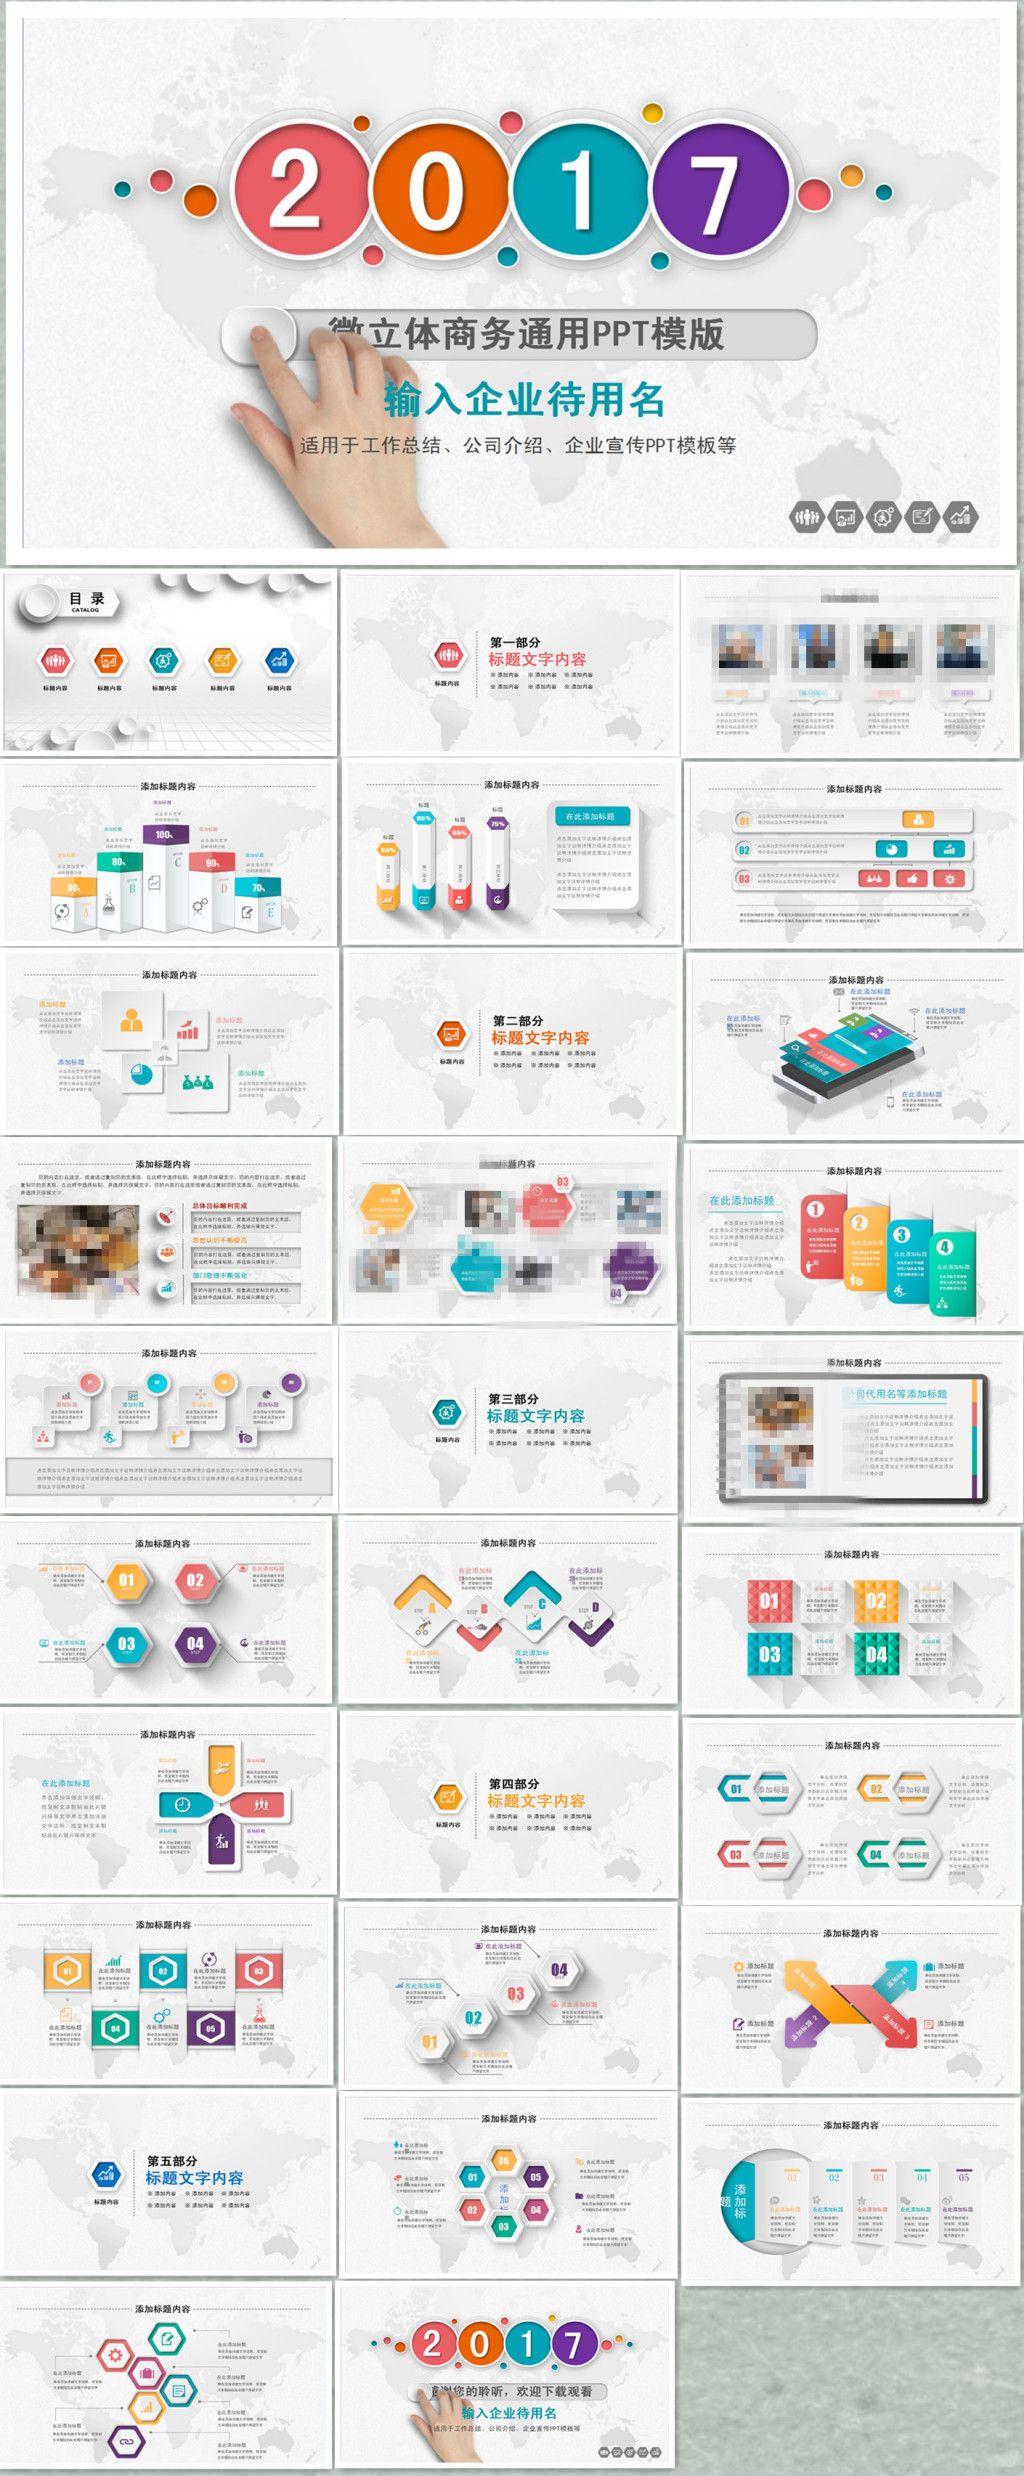 Fine General Work Summary Report Powerpoint Template Powerpoint